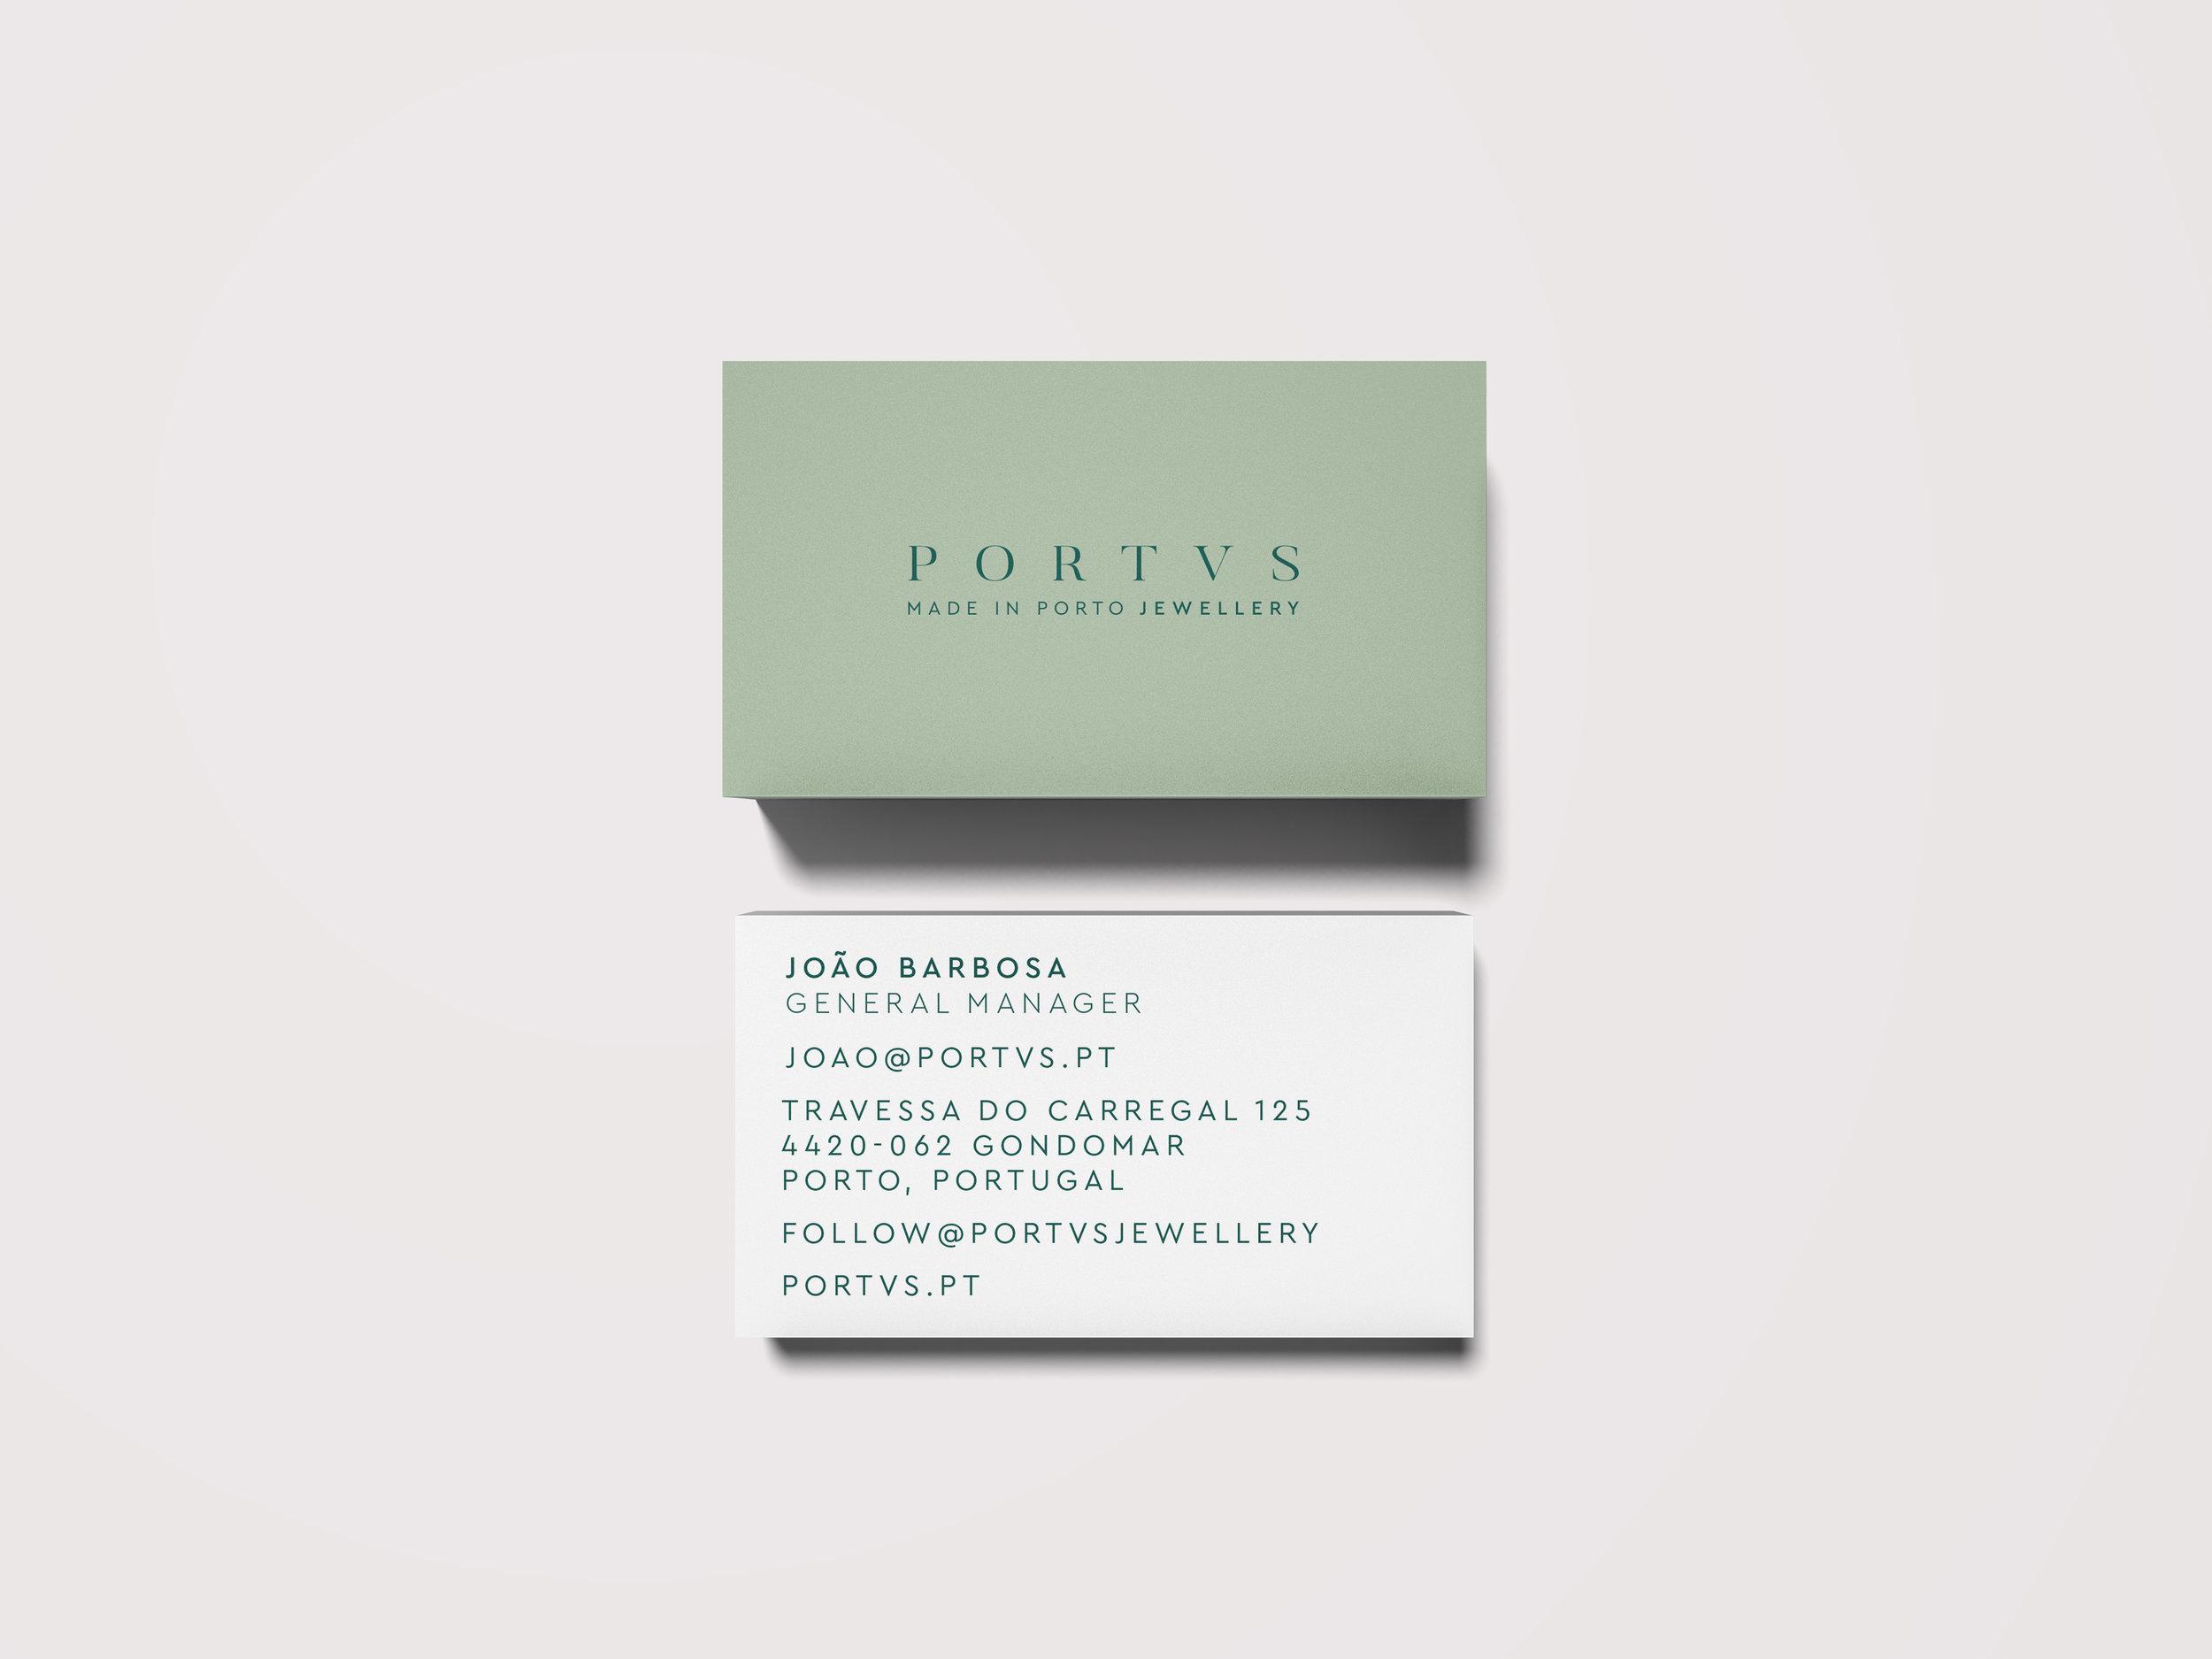 portvs-business-card-fashion-makers.jpg